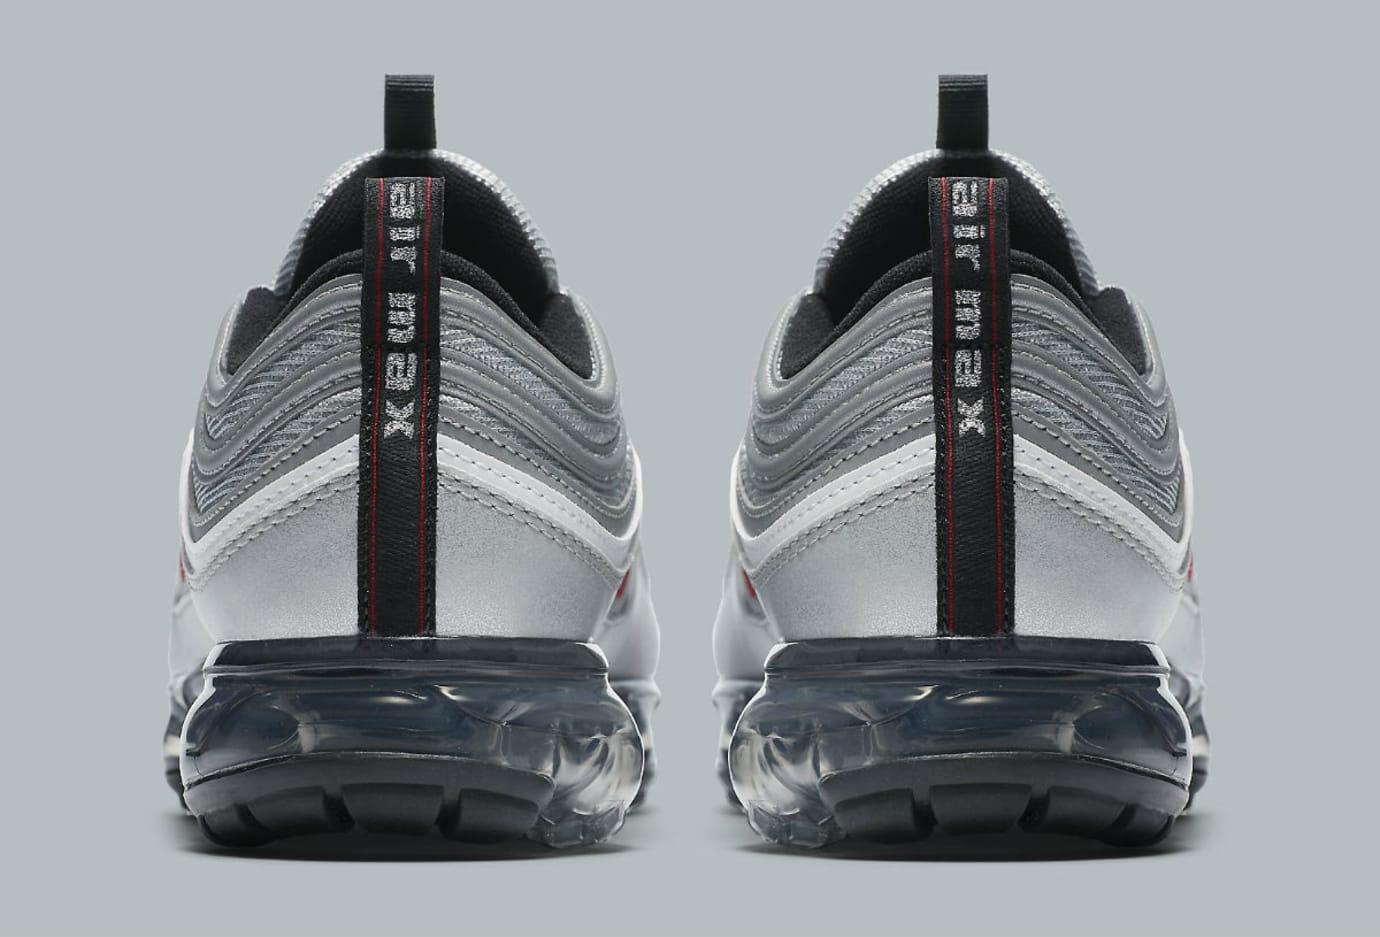 Nike Air VaporMax 97 Silver Bullet Release Date AJ7291 002